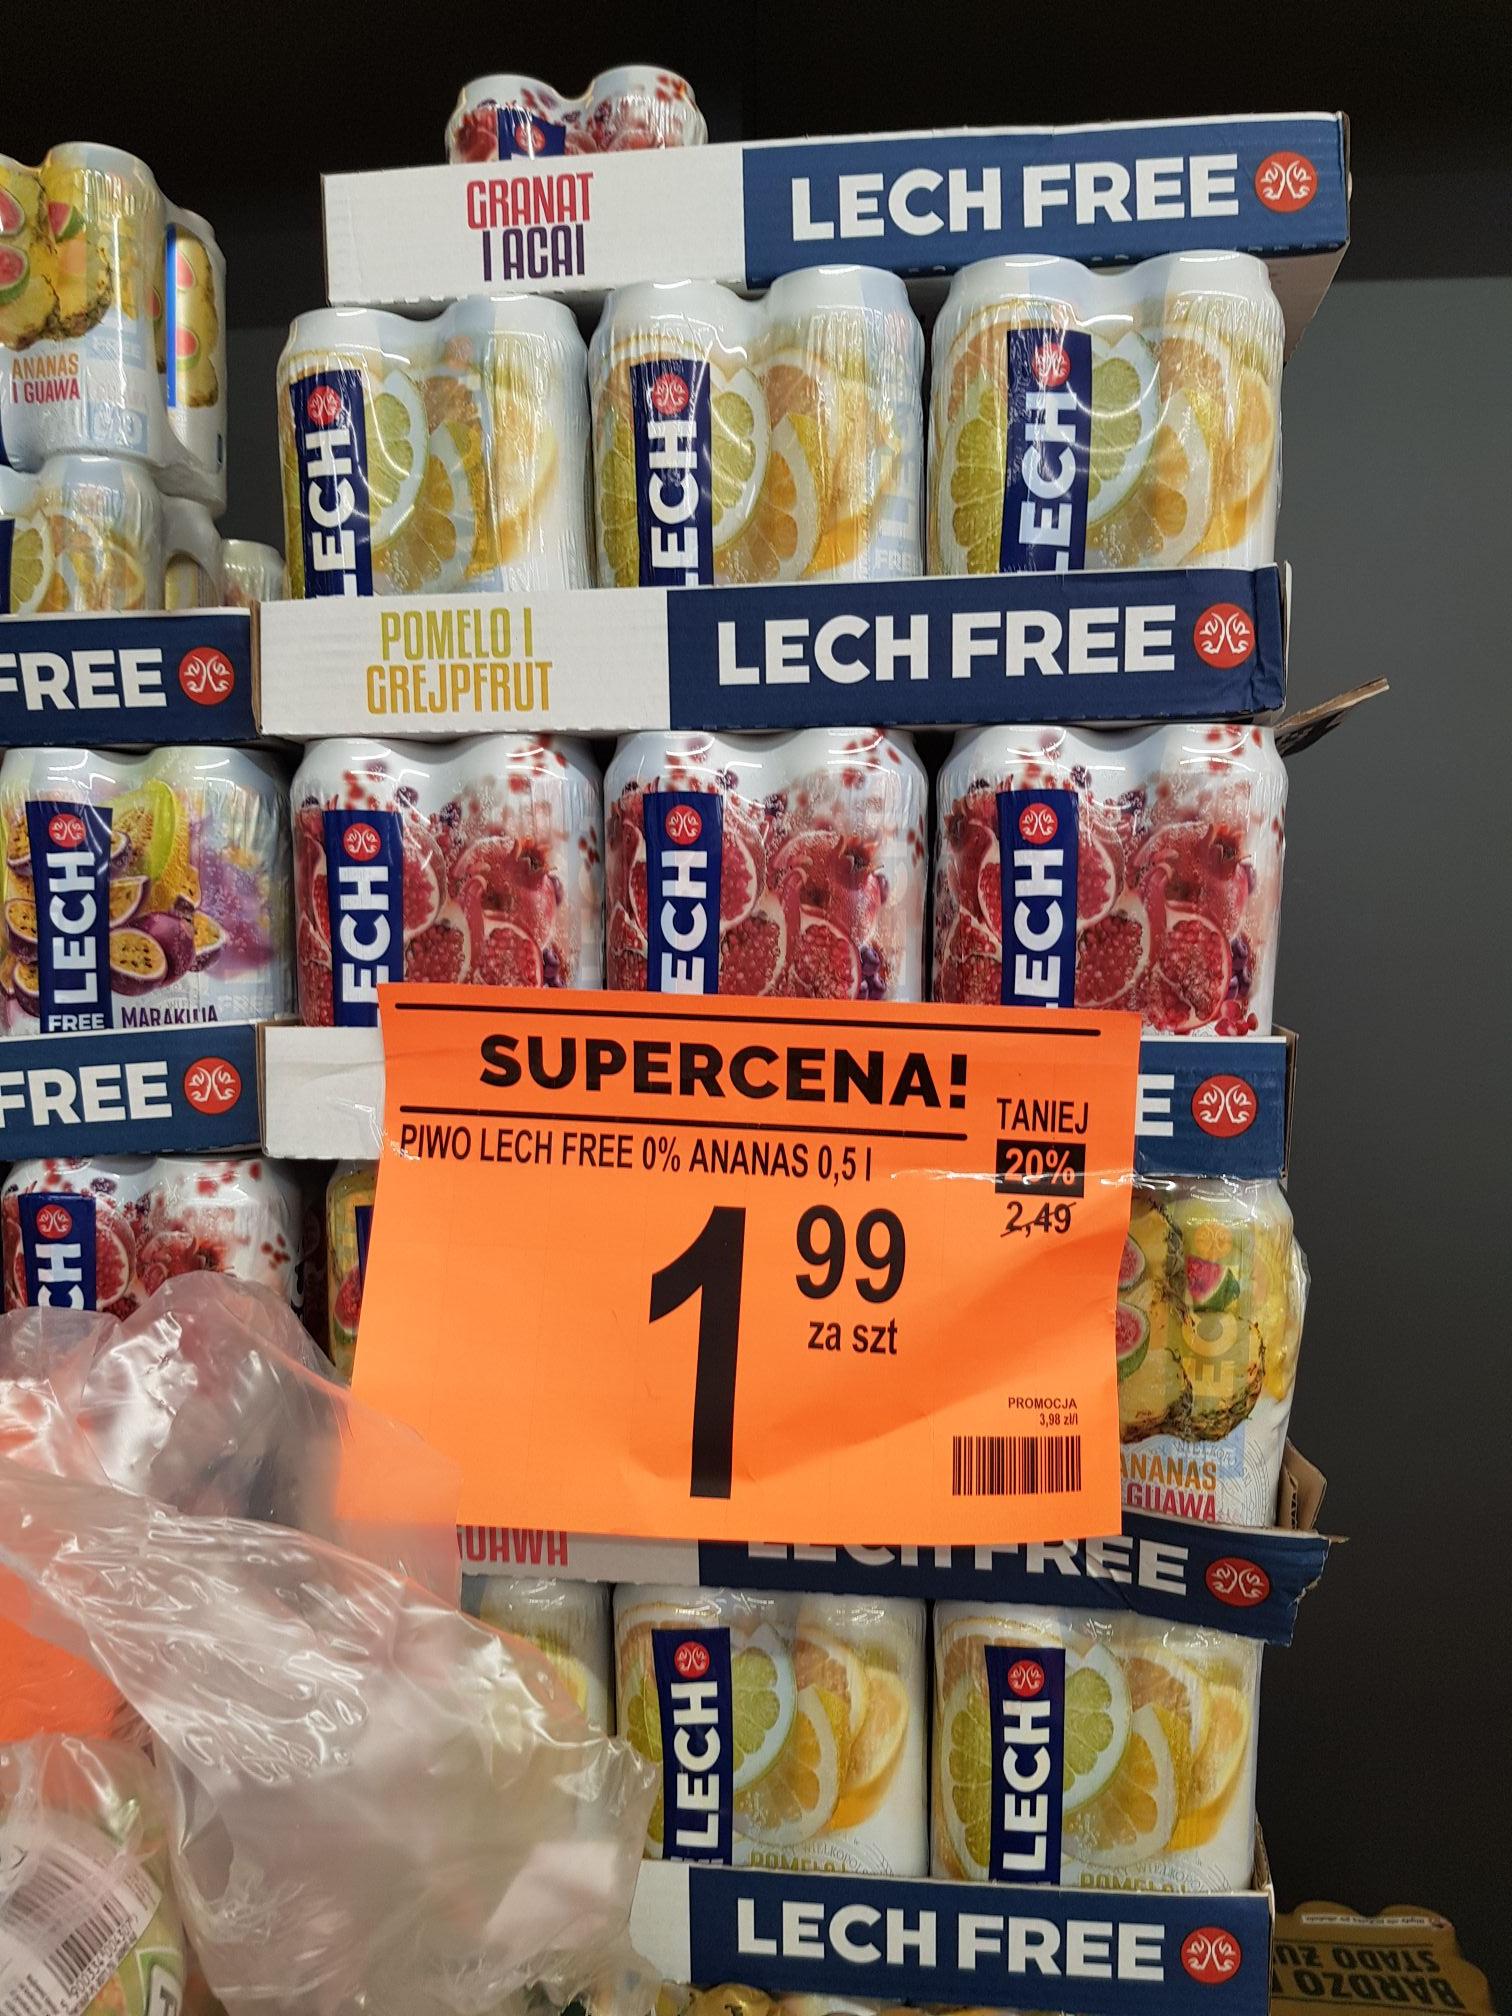 Lech free 0% Biedronka